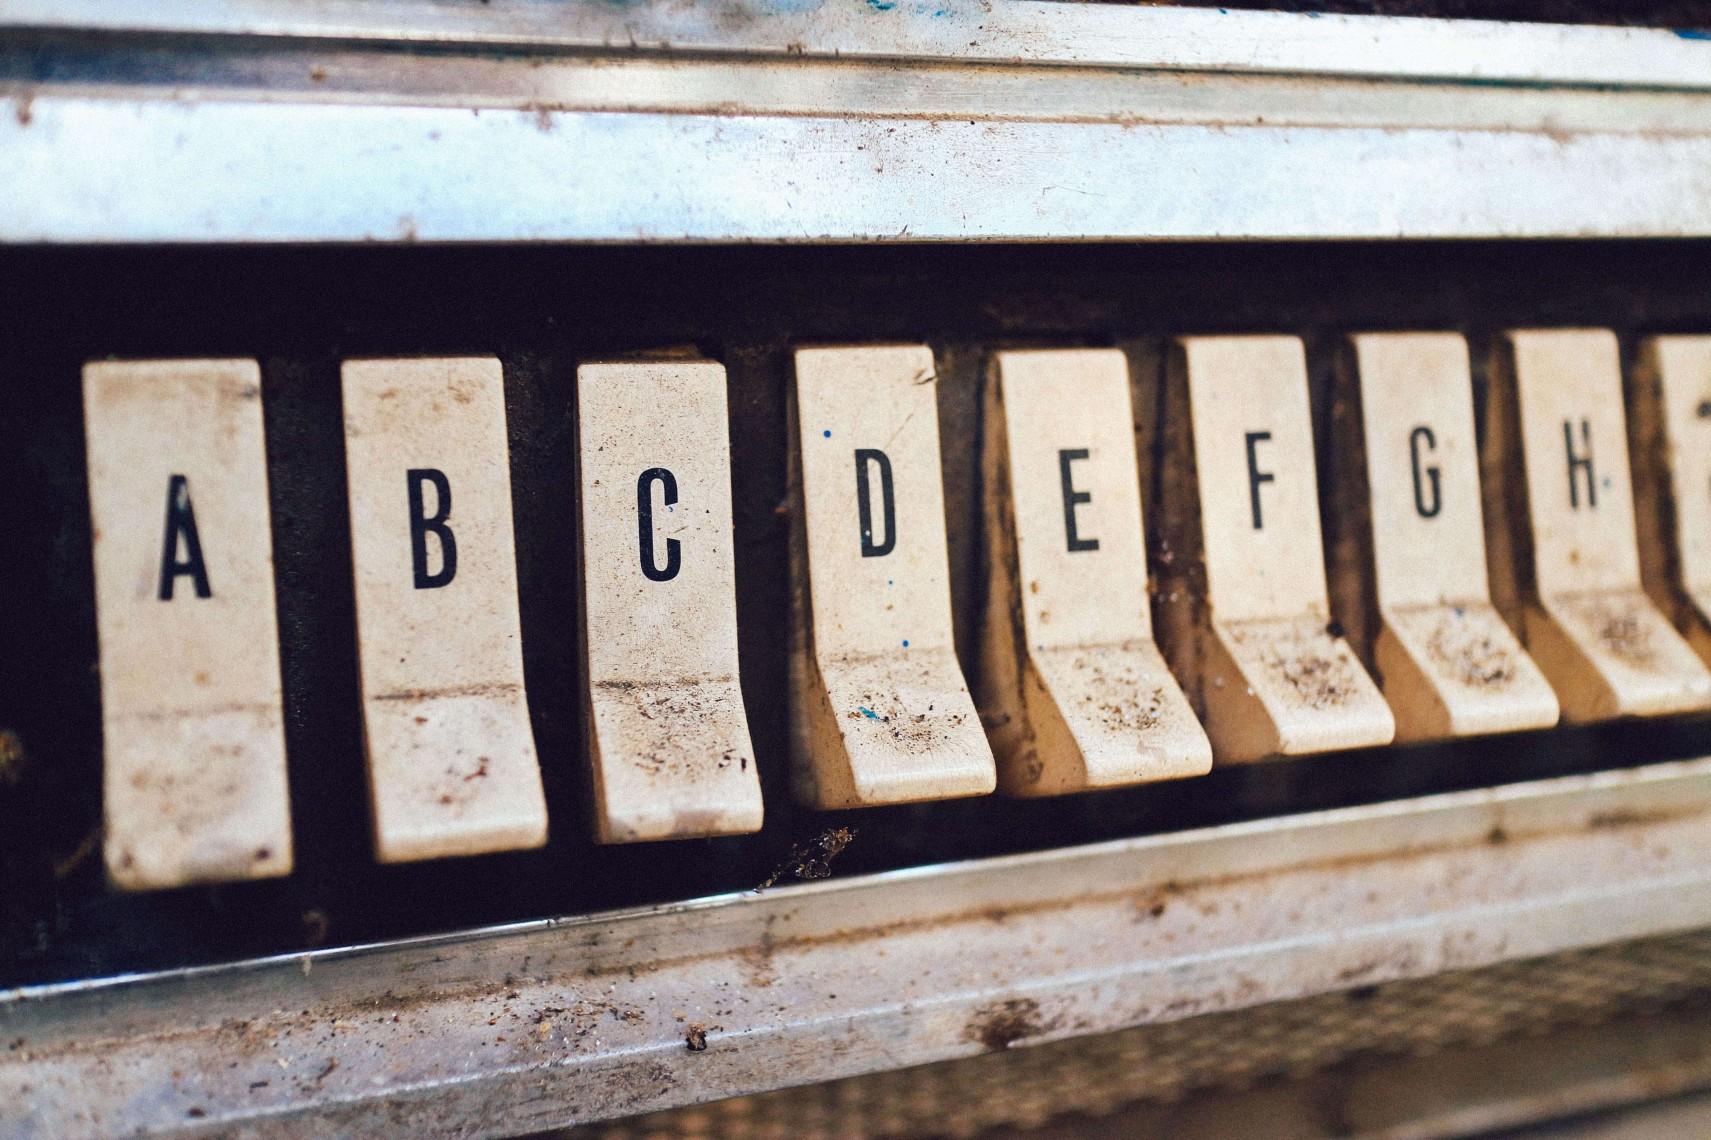 Ile Liter Ma Alfabet Angielski Alingua Profesjonalne